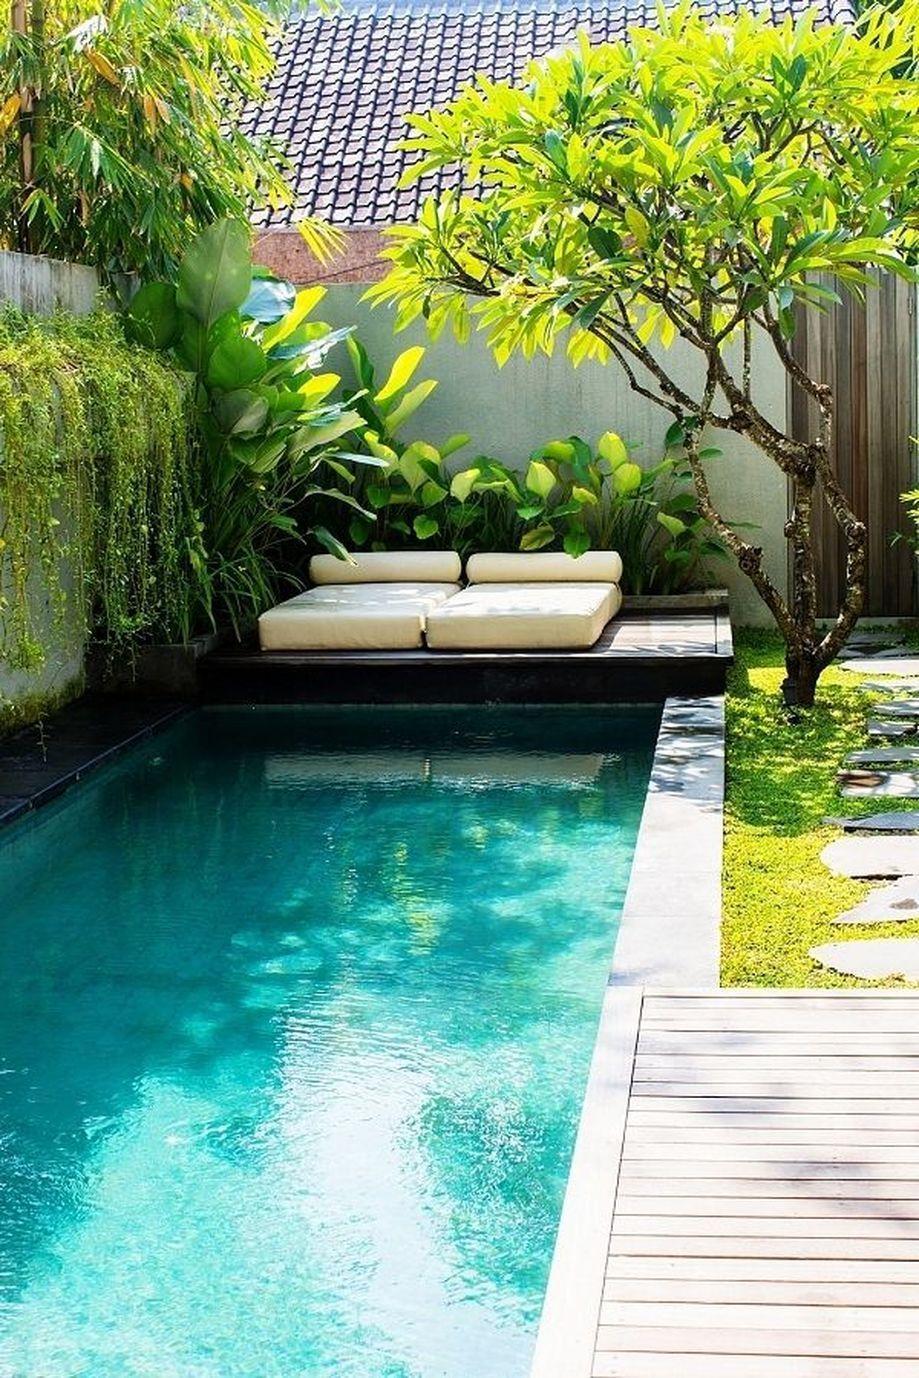 Awesome Small Pool Design For Home Backyard 40 Hoommy Com Piscina Para Espaco Pequeno Piscinas Para Jardins Pequenos Jardins Pequenos Backyard mini swimming pool